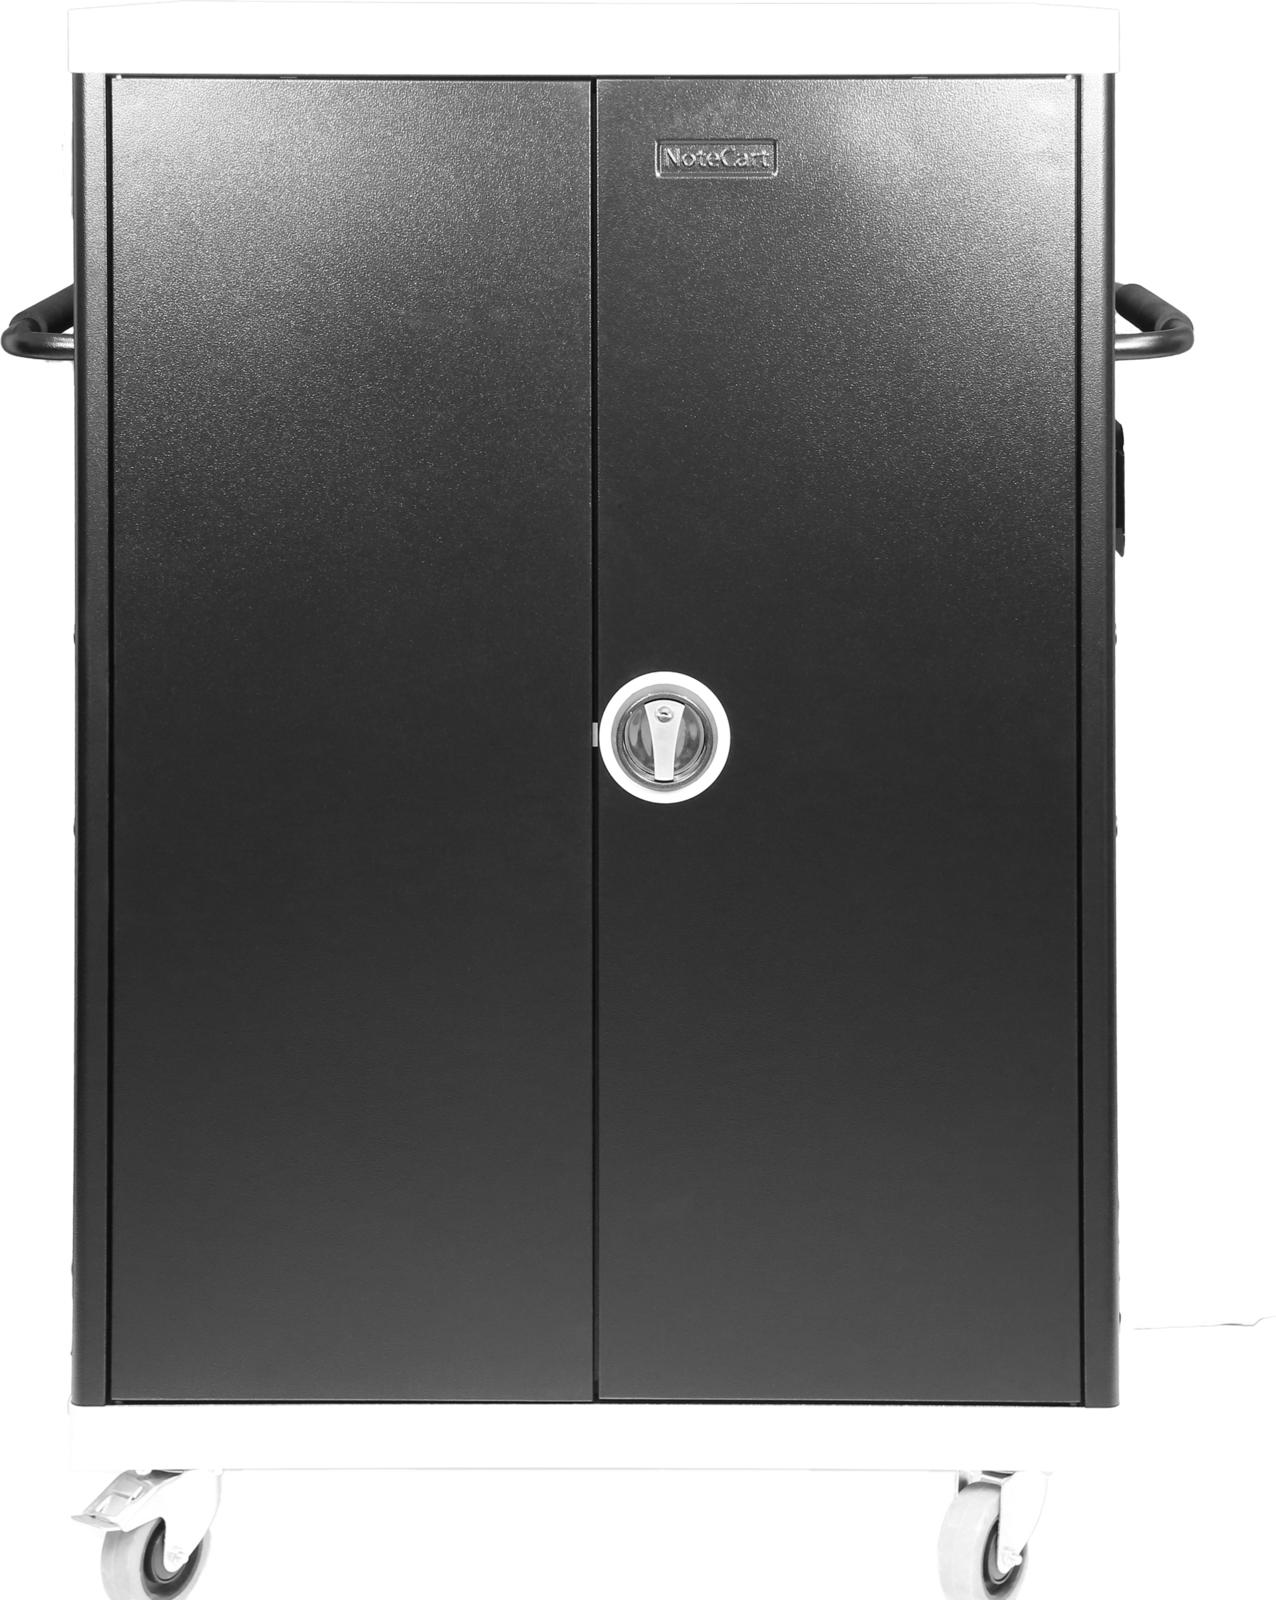 Leba NoteCart UniFit for 32 Laptops Horizontal storage for Laptops NCU-32-FH-DK - eet01